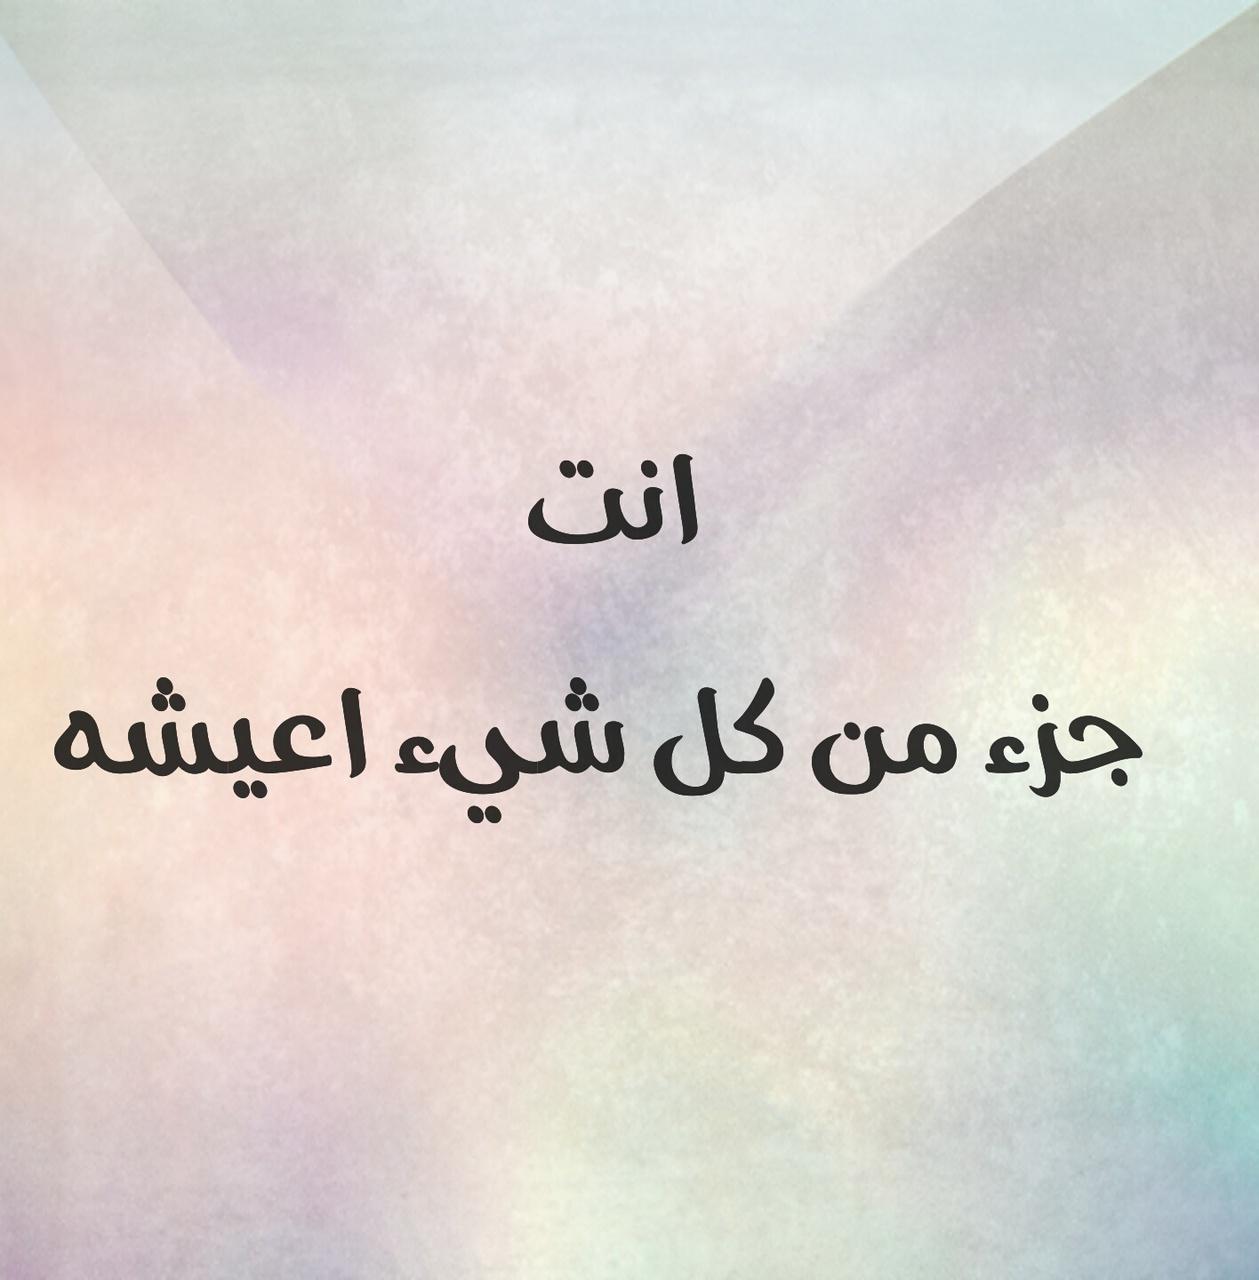 بالصور رمزيات كلام جميل , كلام جميل رمزيات روعه 3536 2